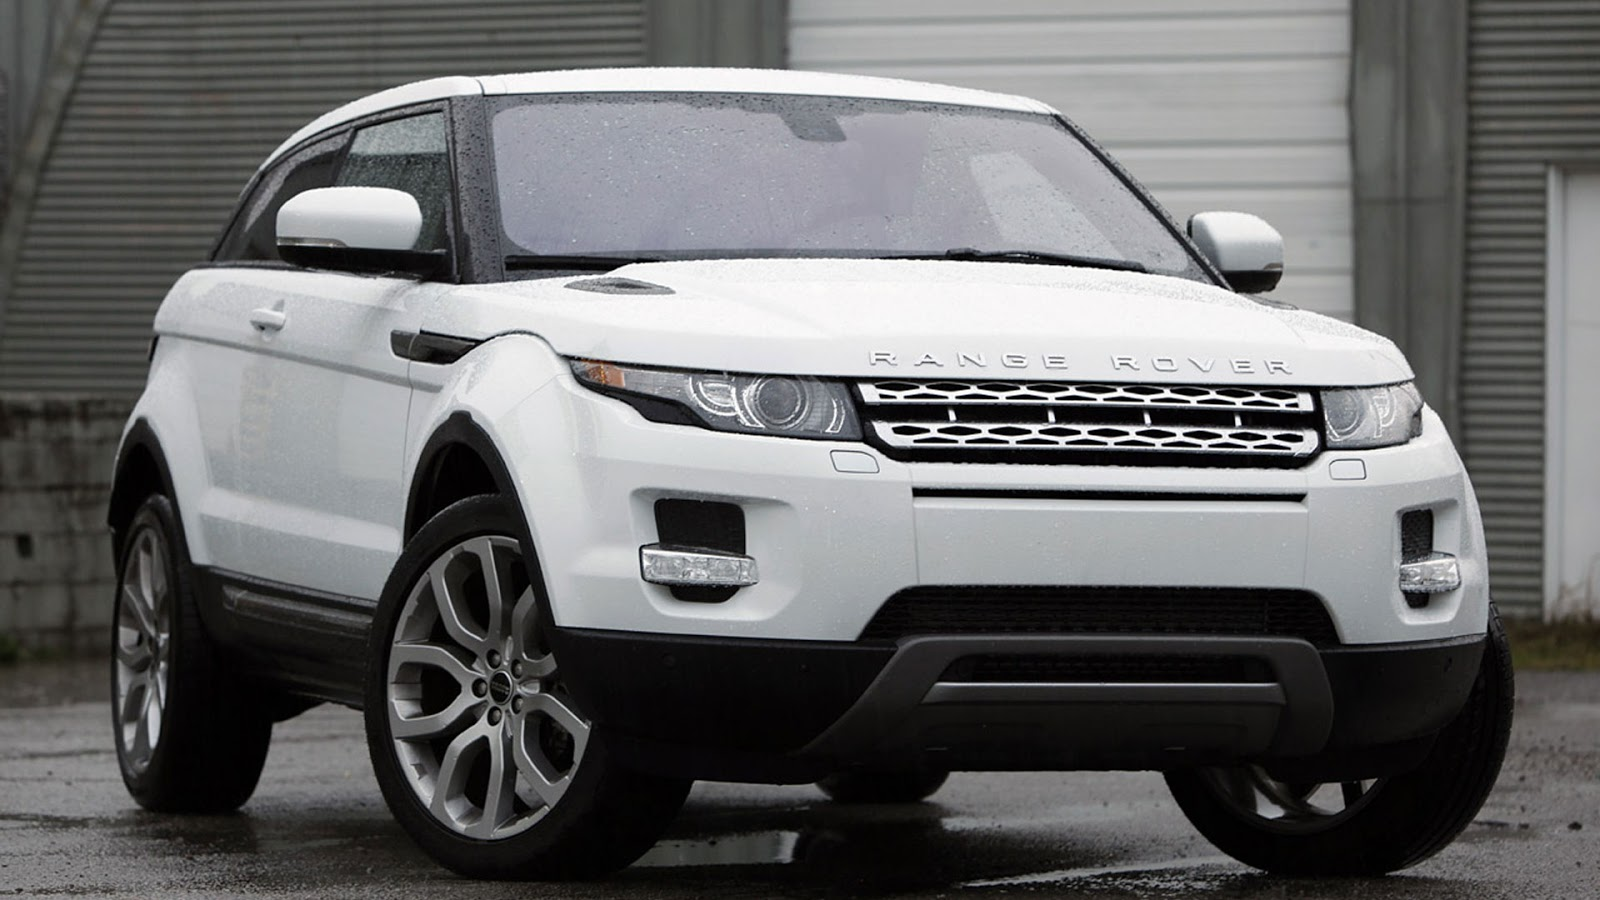 2016 land rover range rover release date prices. Black Bedroom Furniture Sets. Home Design Ideas